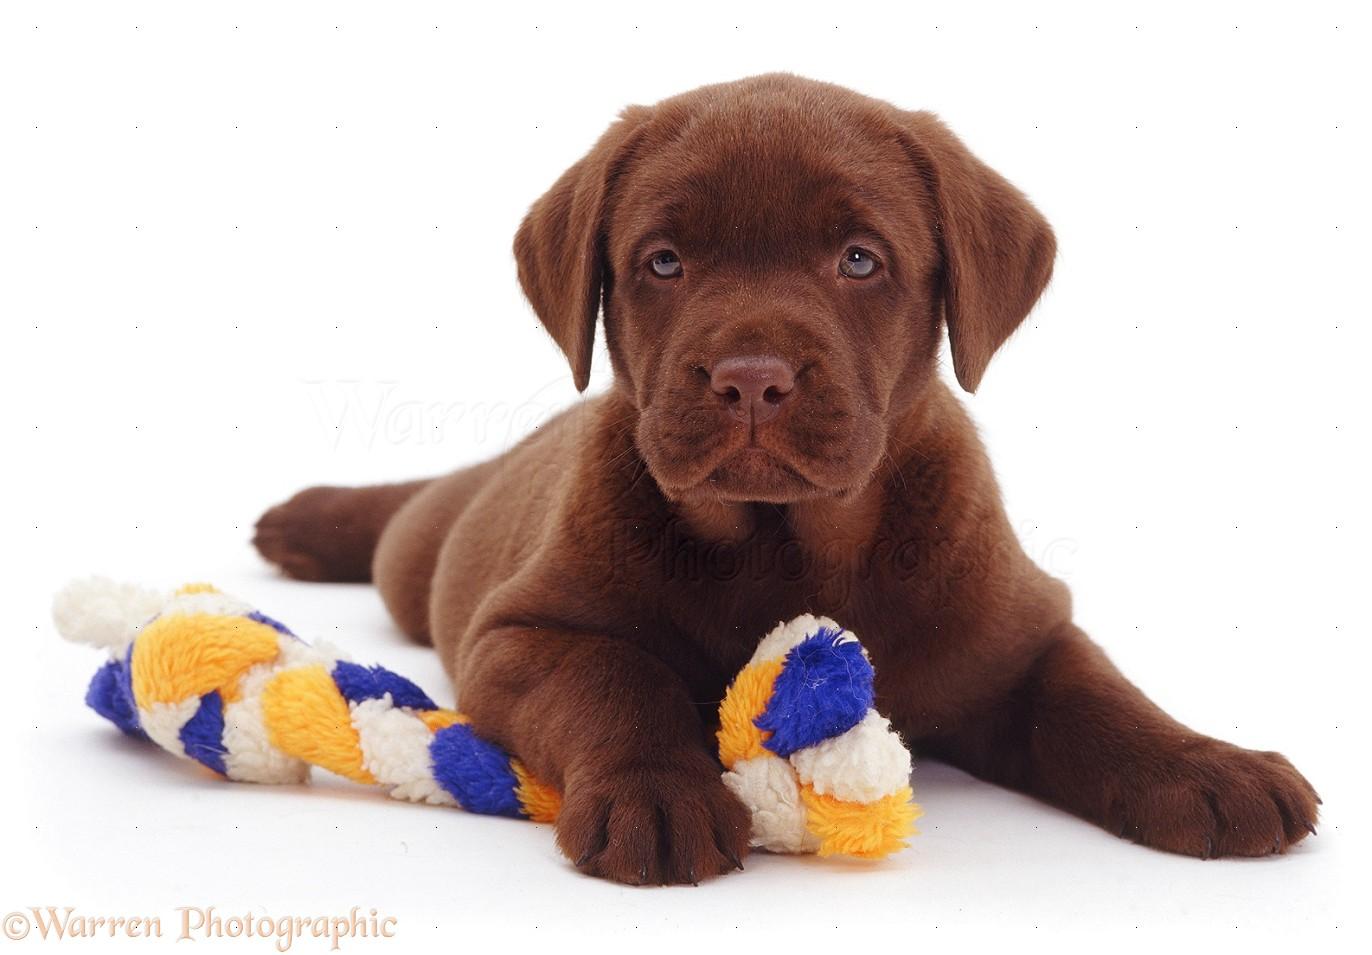 Dog: Chocolate Labrador Retriever pup, 6 weeks old photo - WP11382